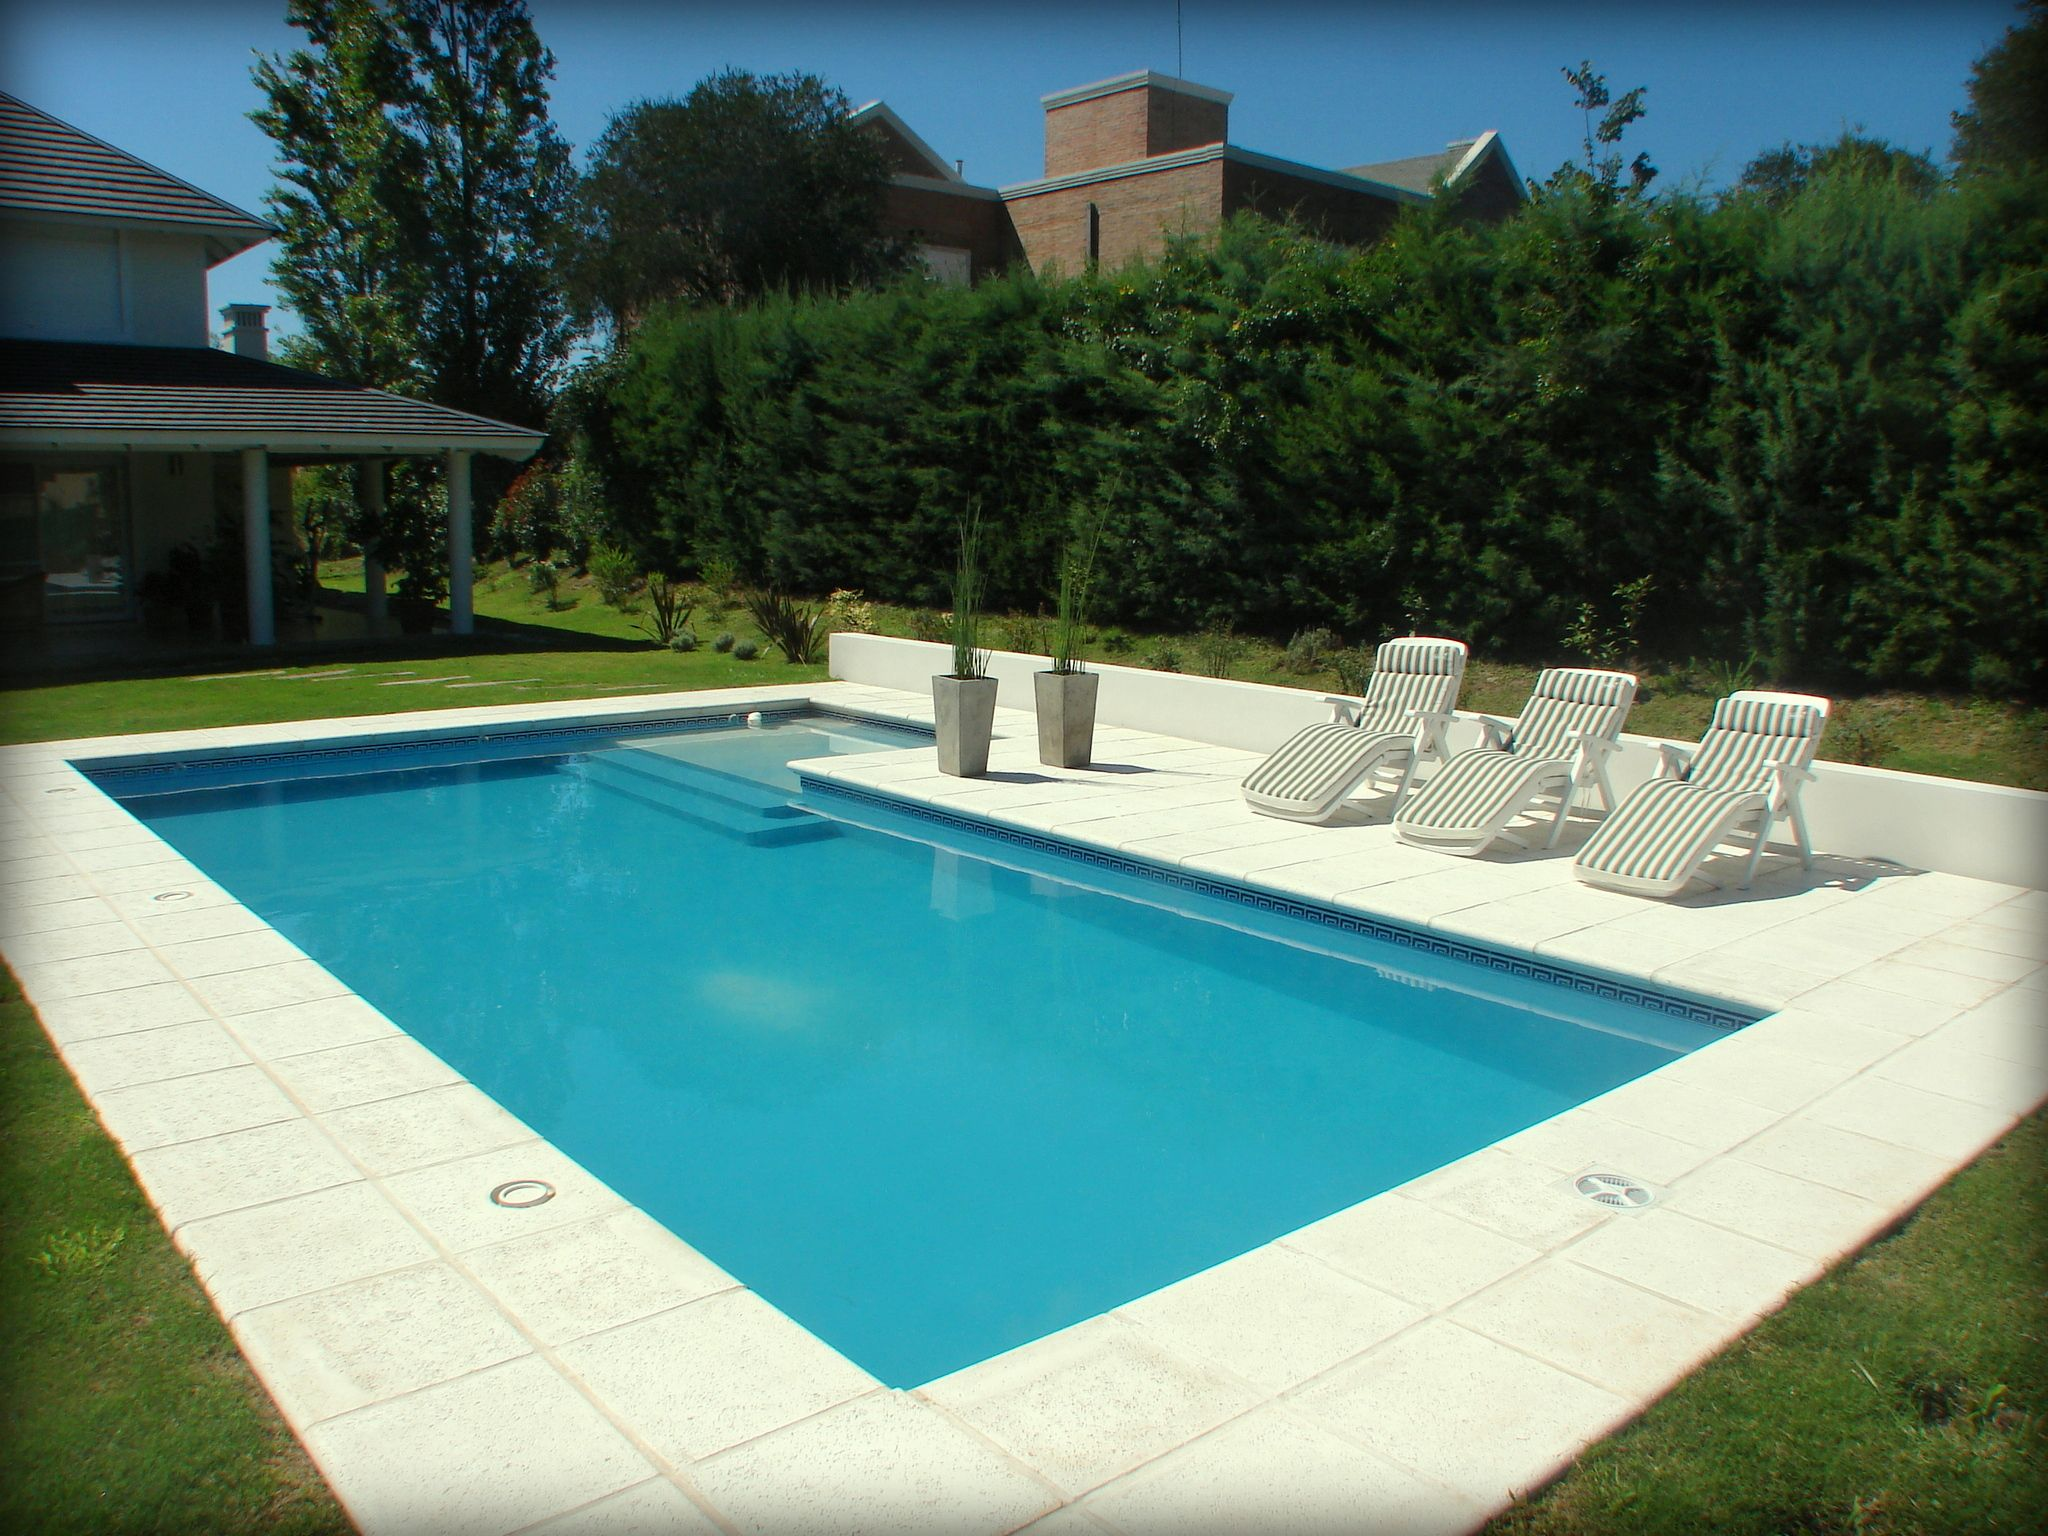 Piscina Swimmingpool Arquitectura Cordoba Dise O